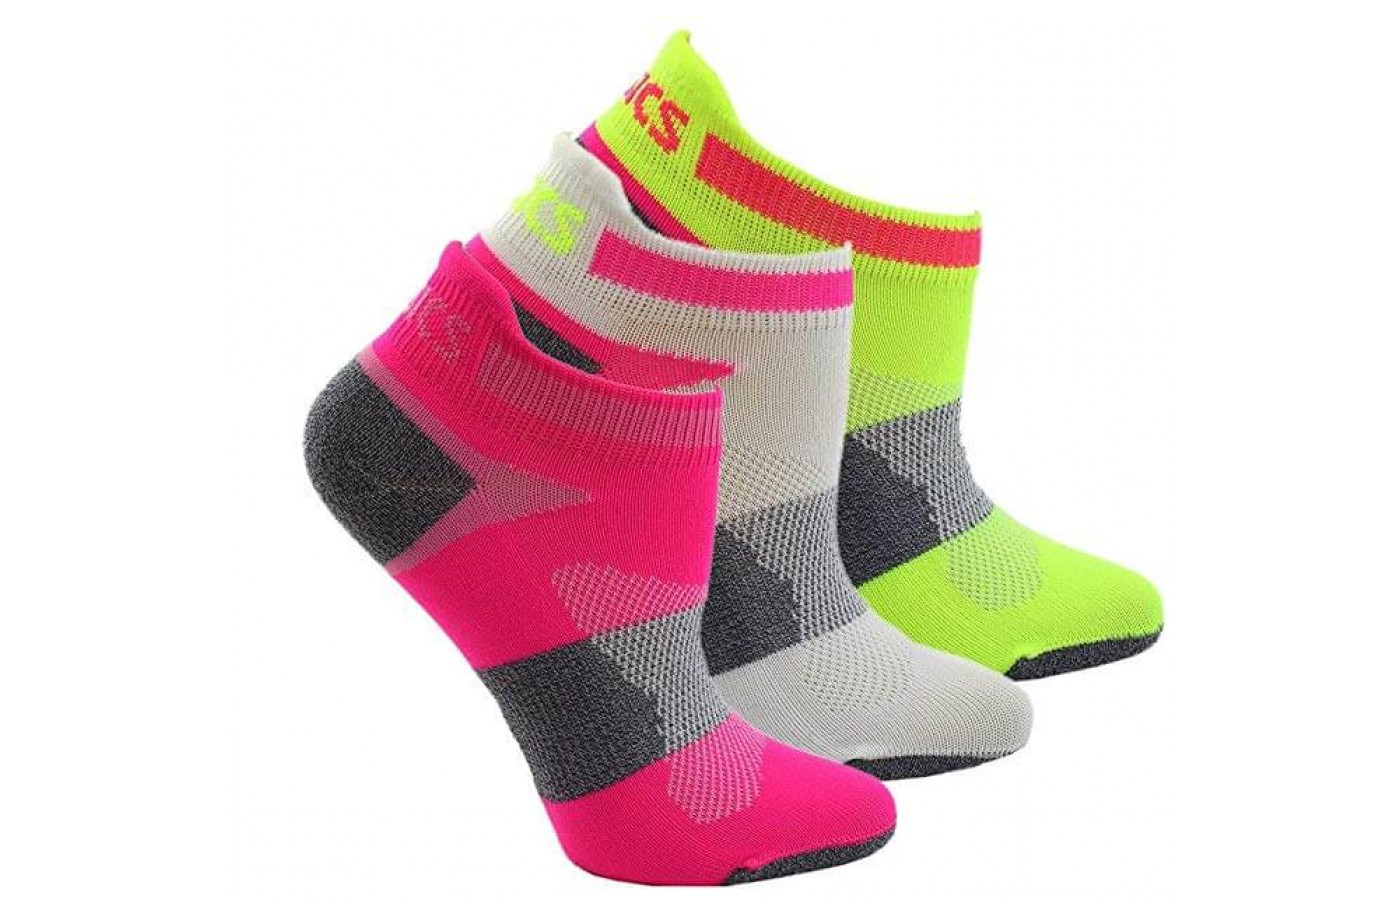 Asics Quick Lyte Socks View